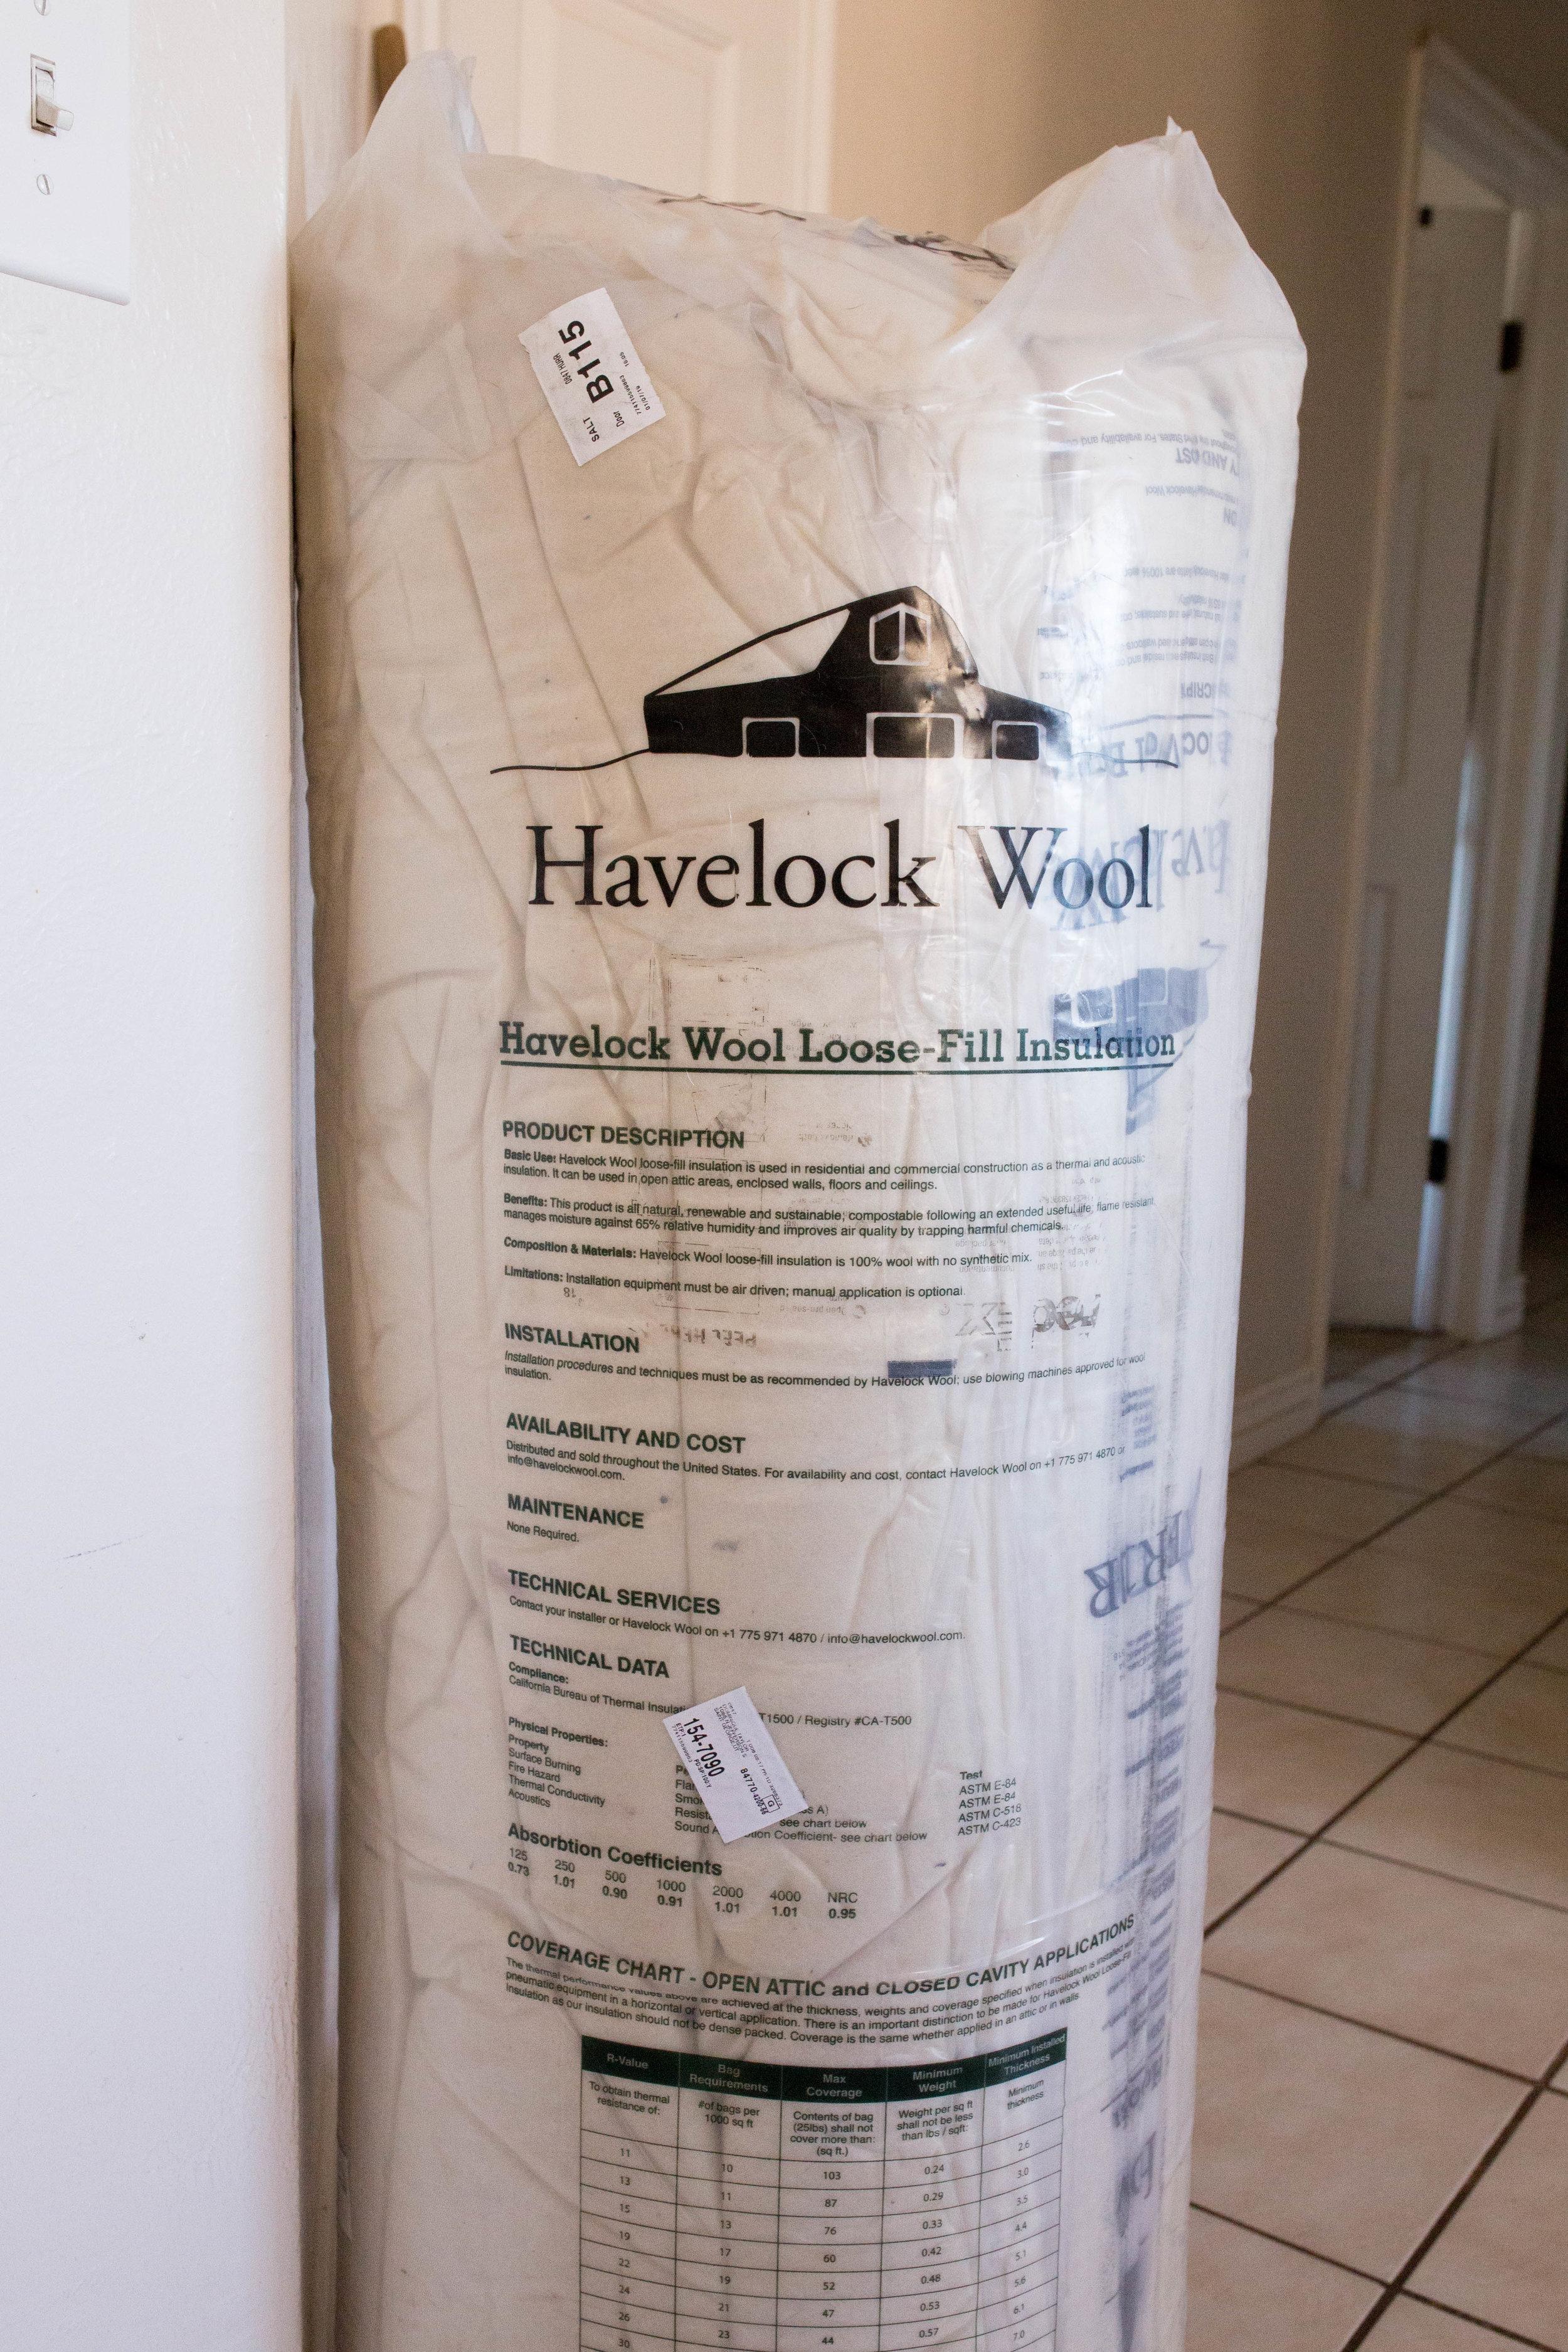 Three bags of 2-inch Havelock Wool batting -